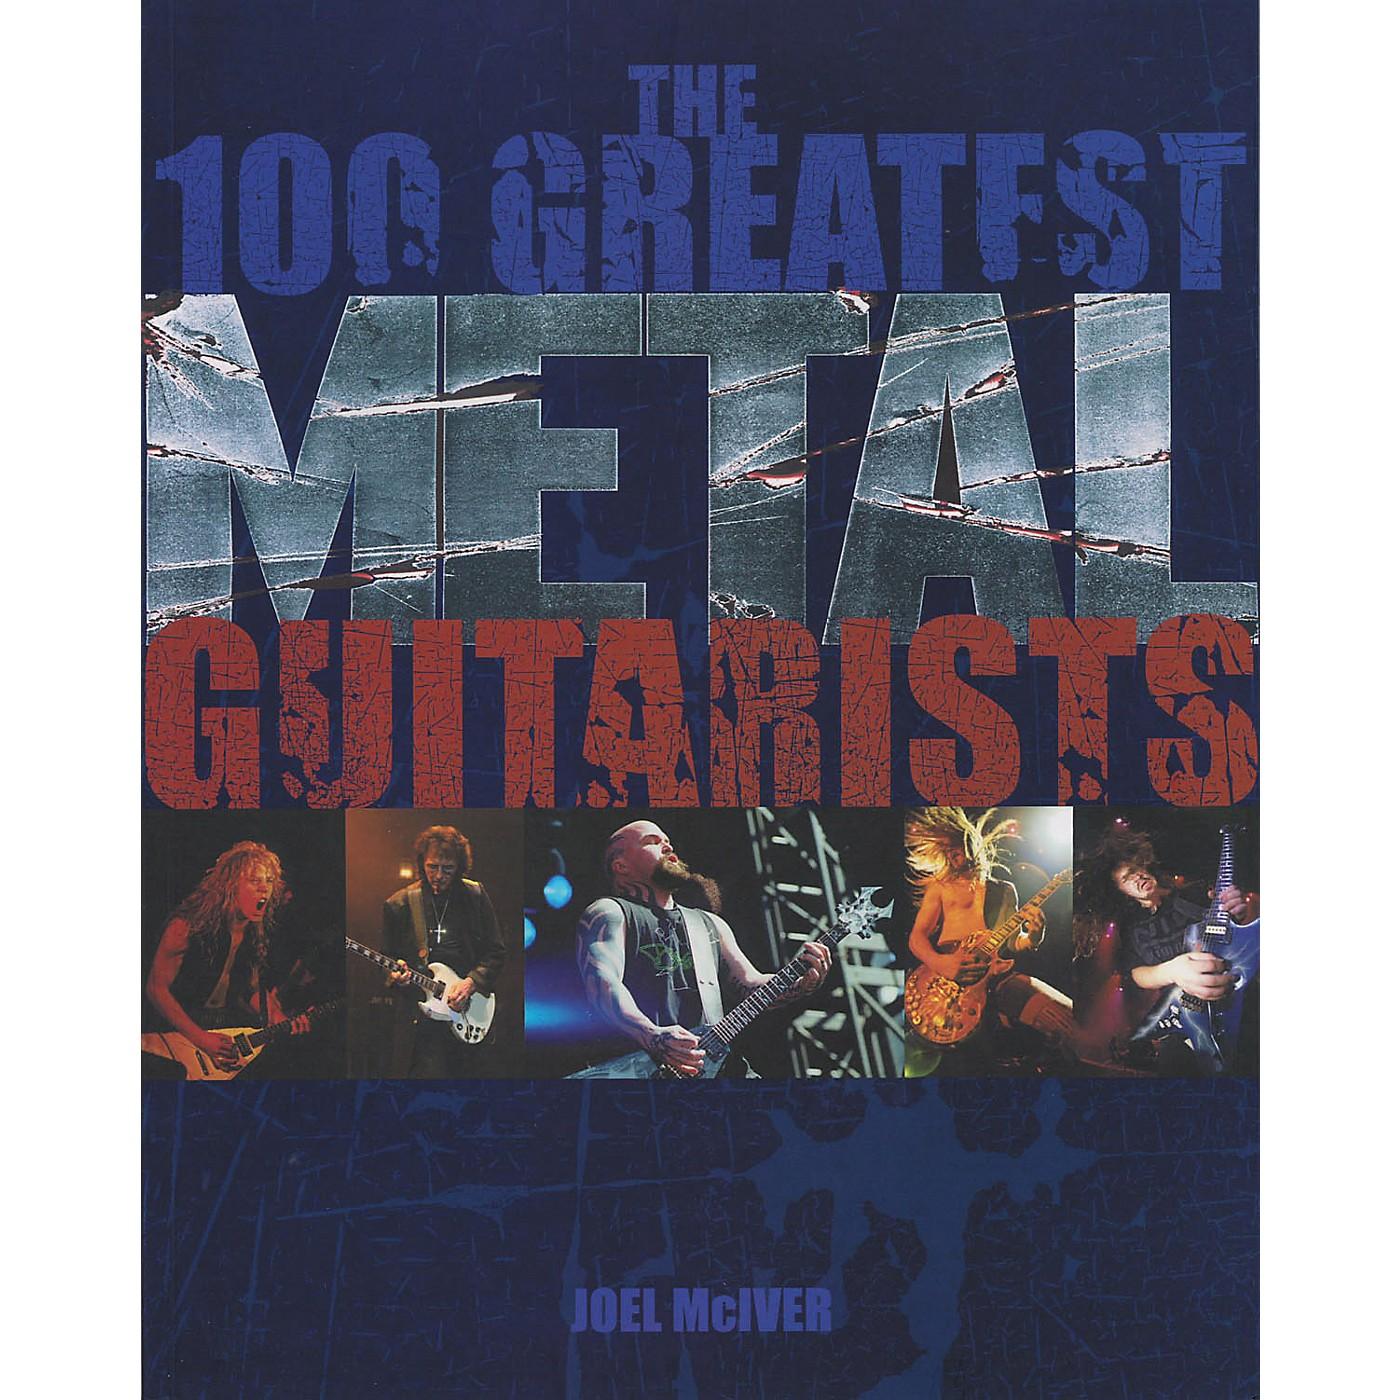 Hal Leonard The 100 Greatest Metal Guitarists (Book) thumbnail